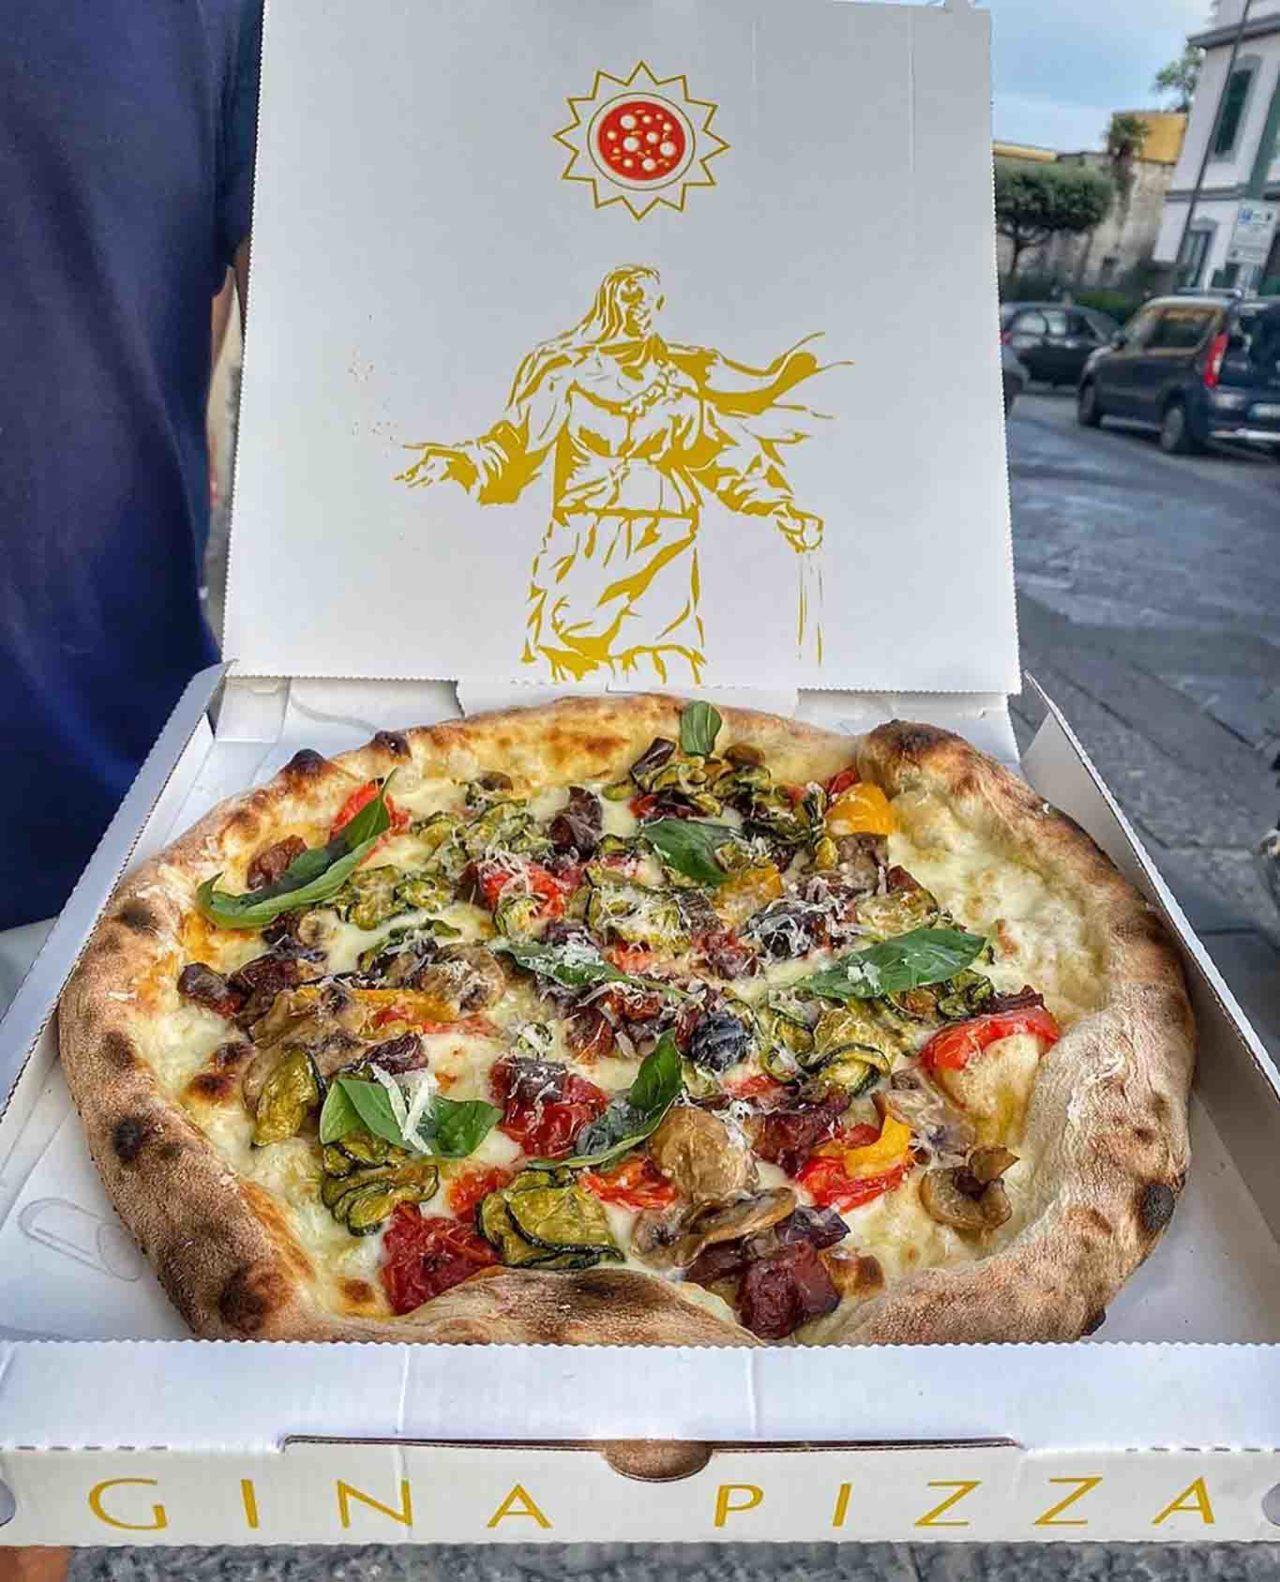 Gina Pizza ortolana Giuseppe Pignalosa